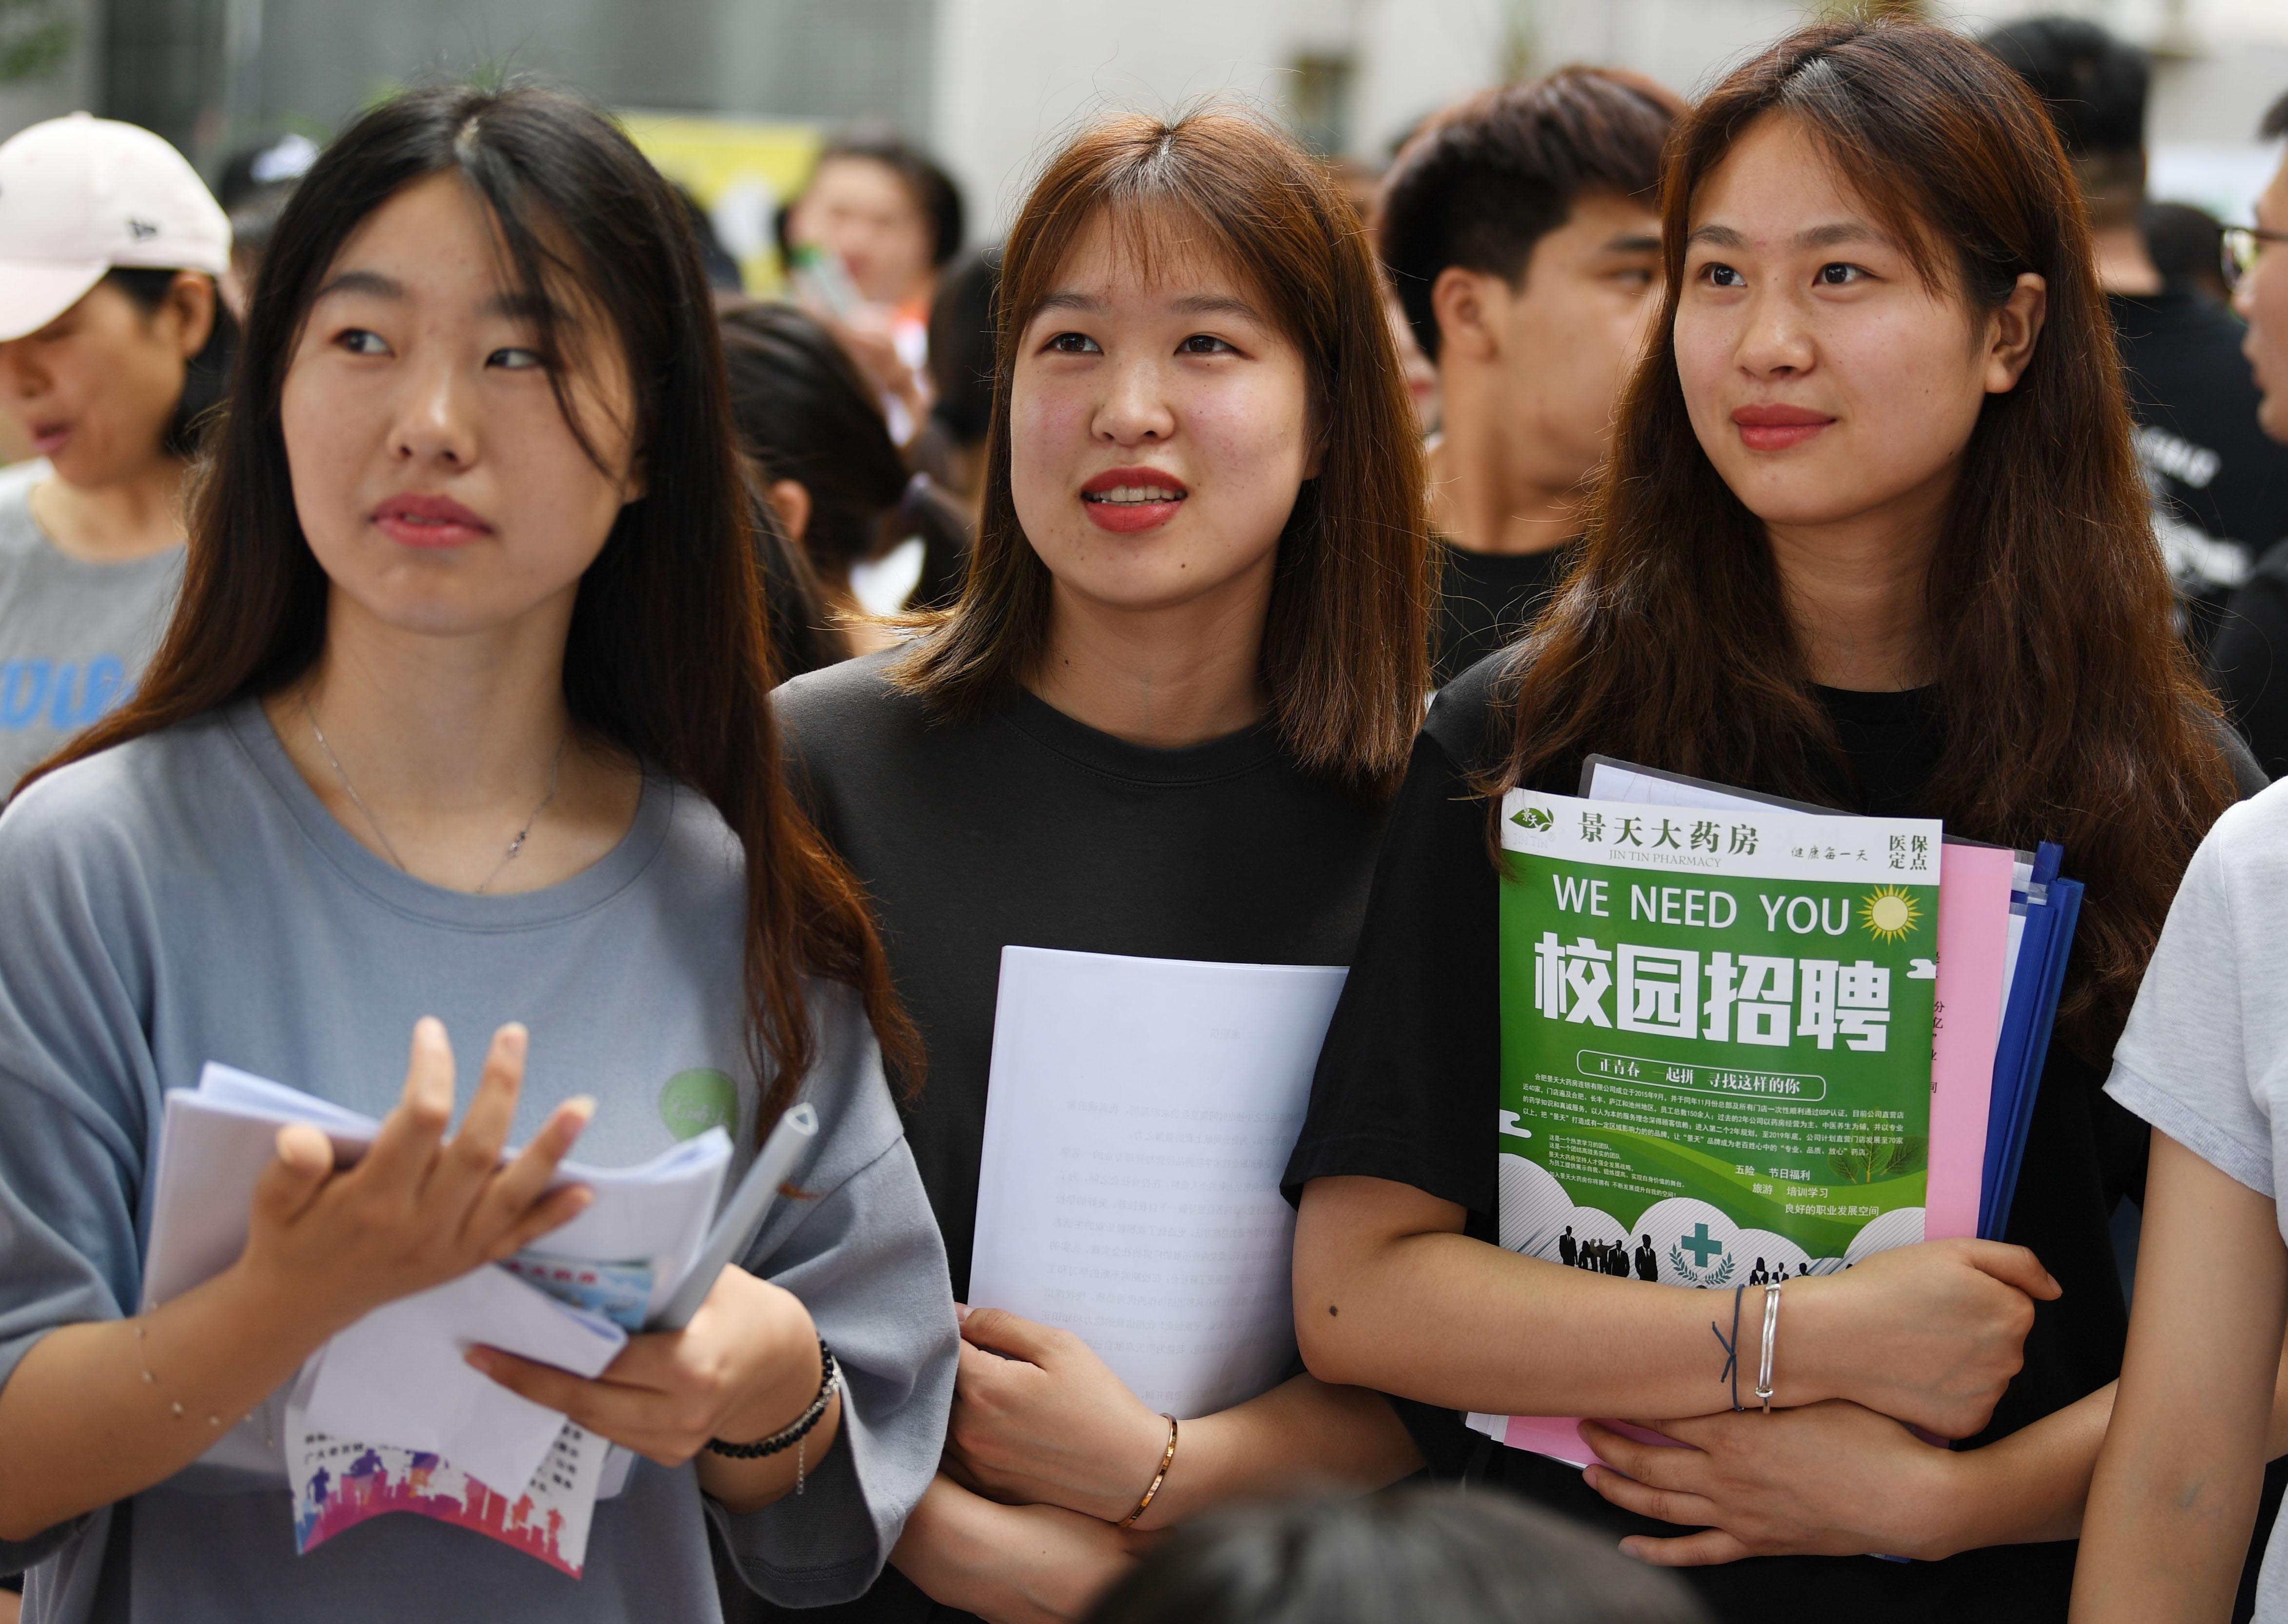 中国大卒者のIT業界就職割合、依然上昇続く